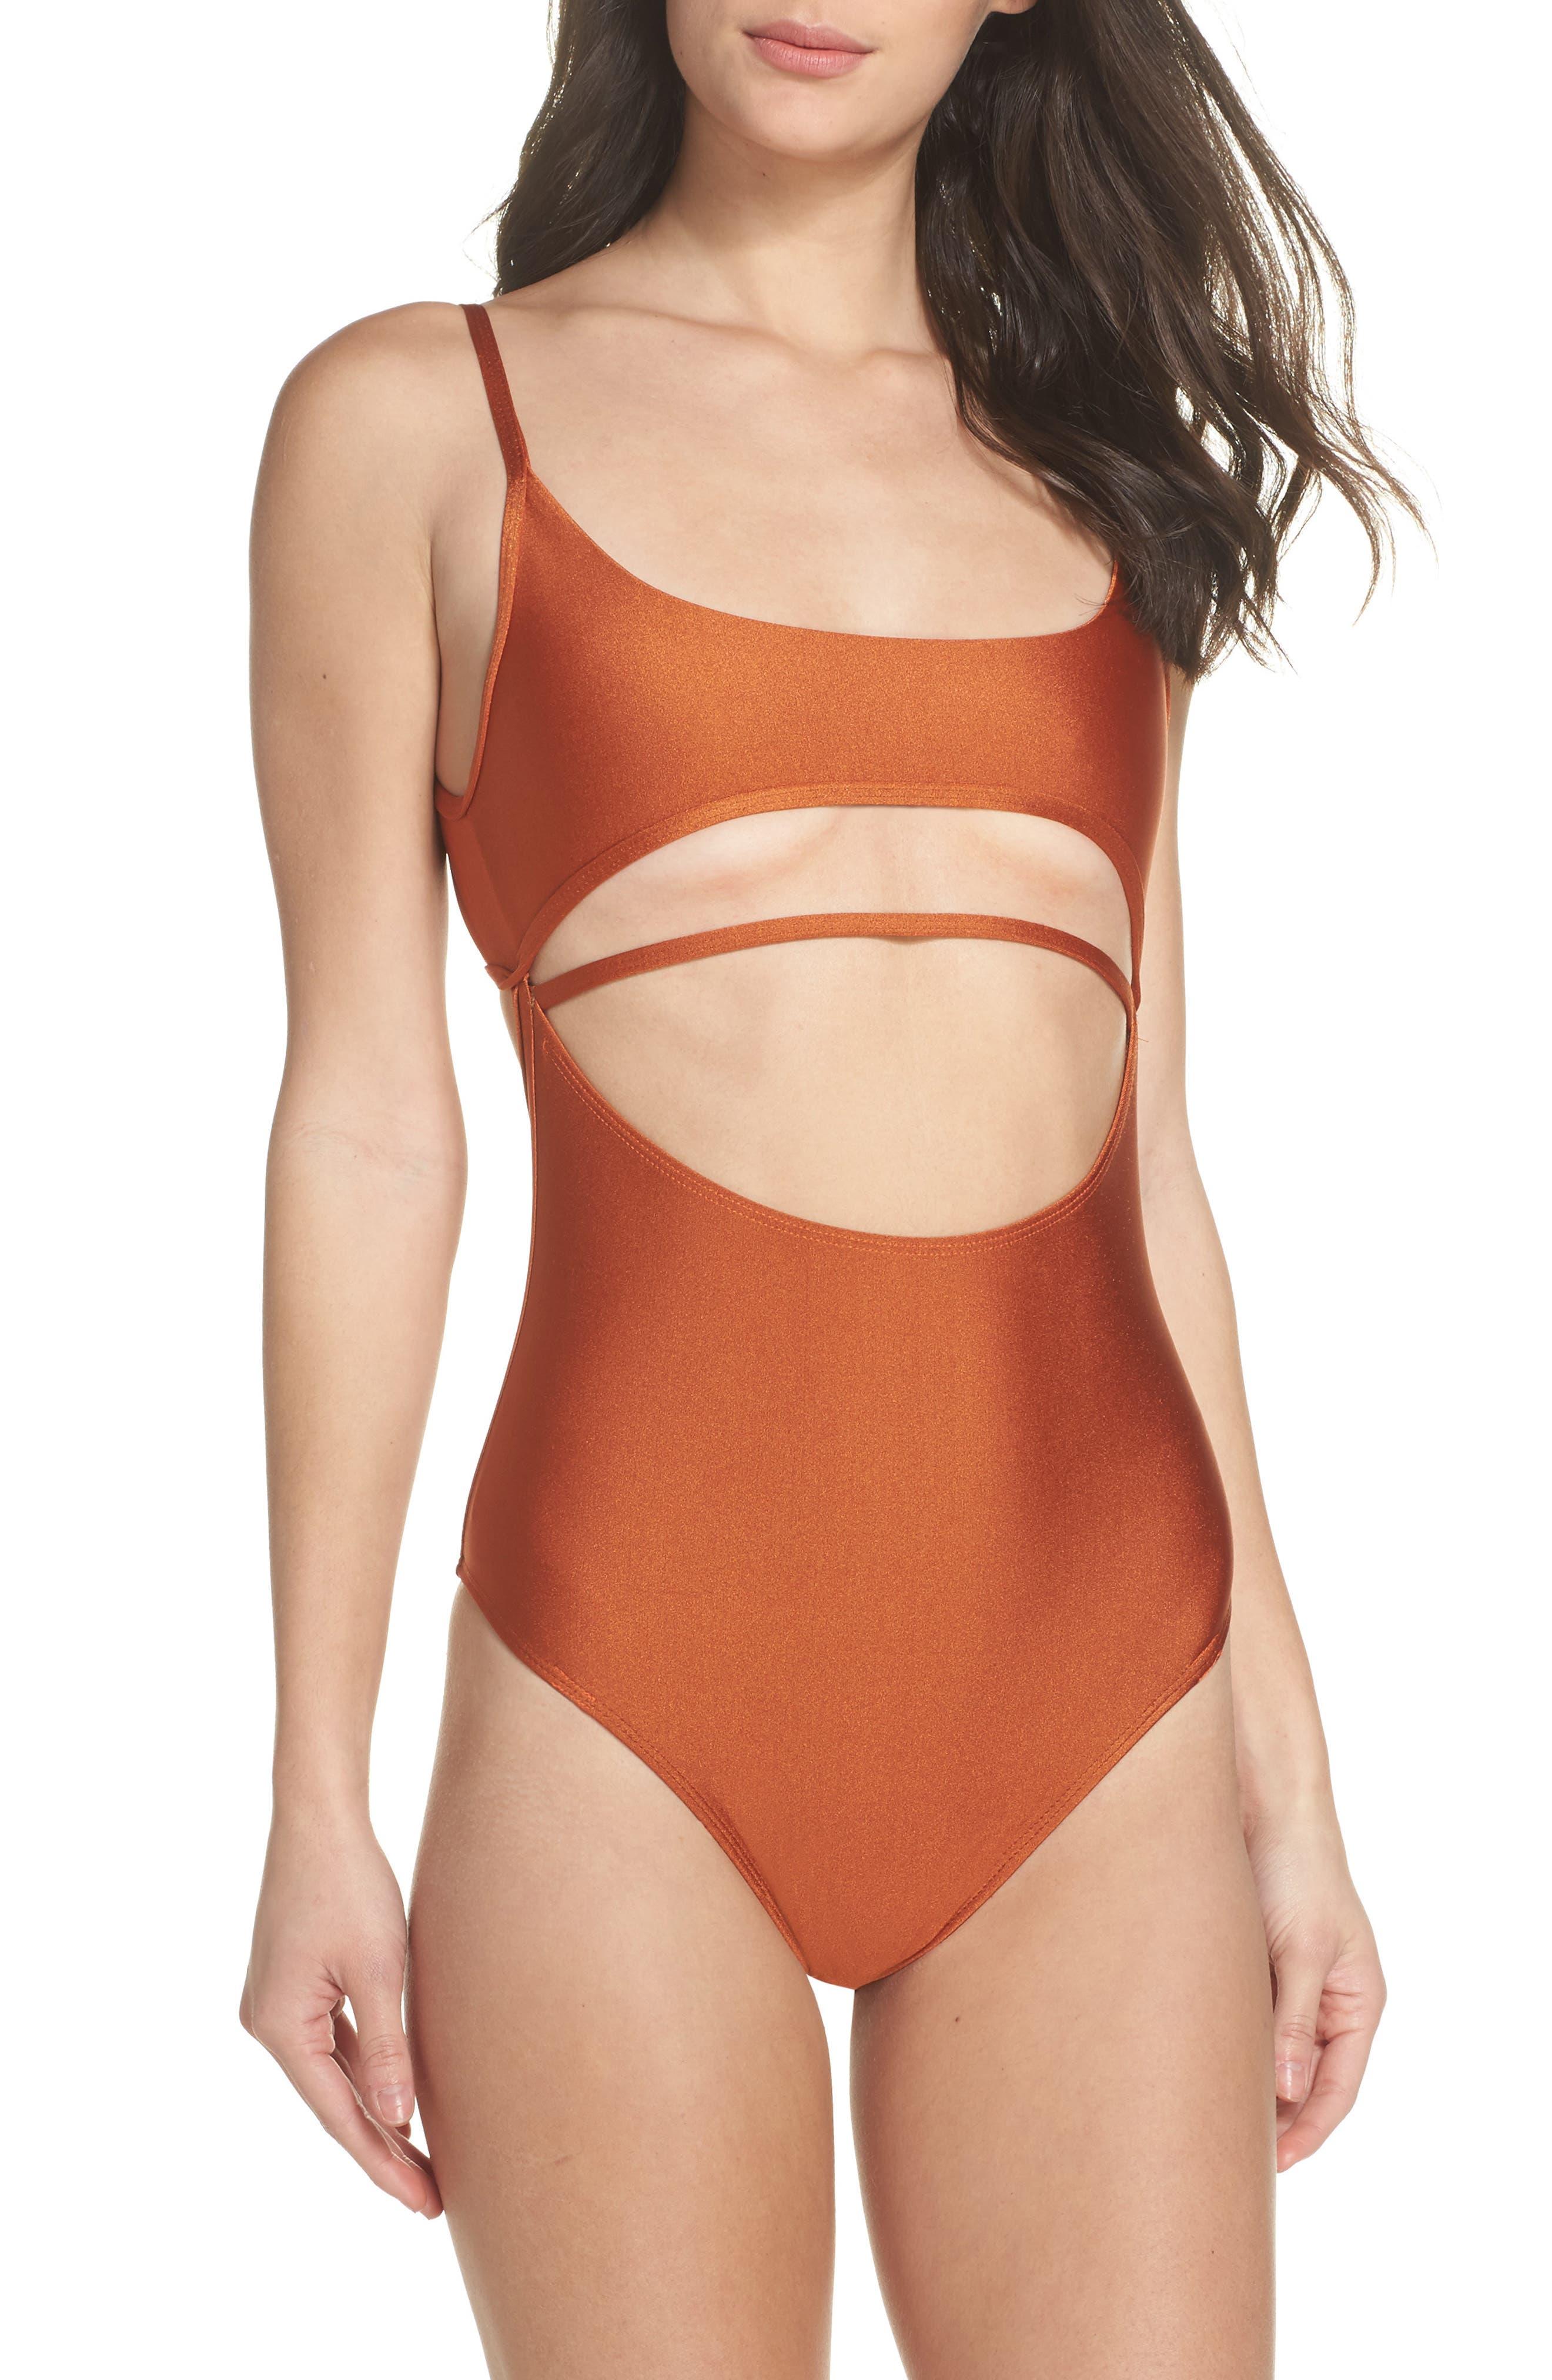 Strata One-Piece Swimsuit,                             Alternate thumbnail 4, color,                             Ginger Orange